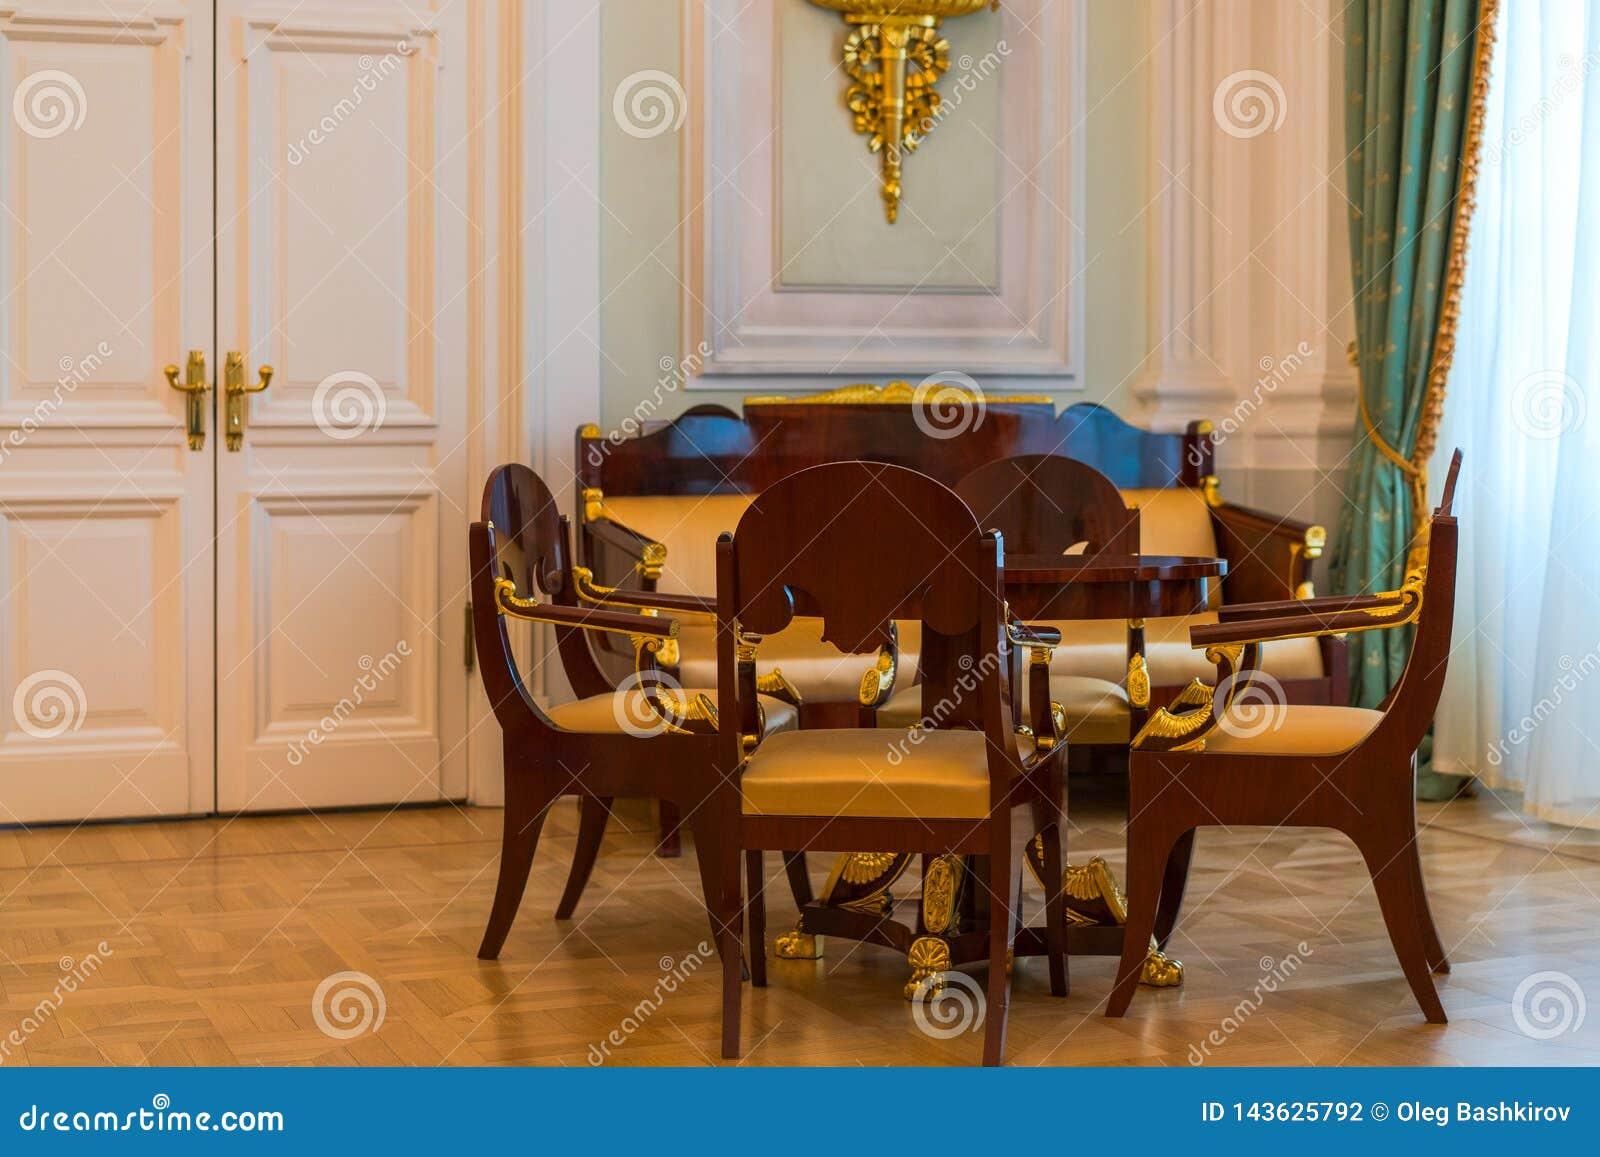 Salon De Style Ancien - Chaises, Sofa, Table Photo stock ...